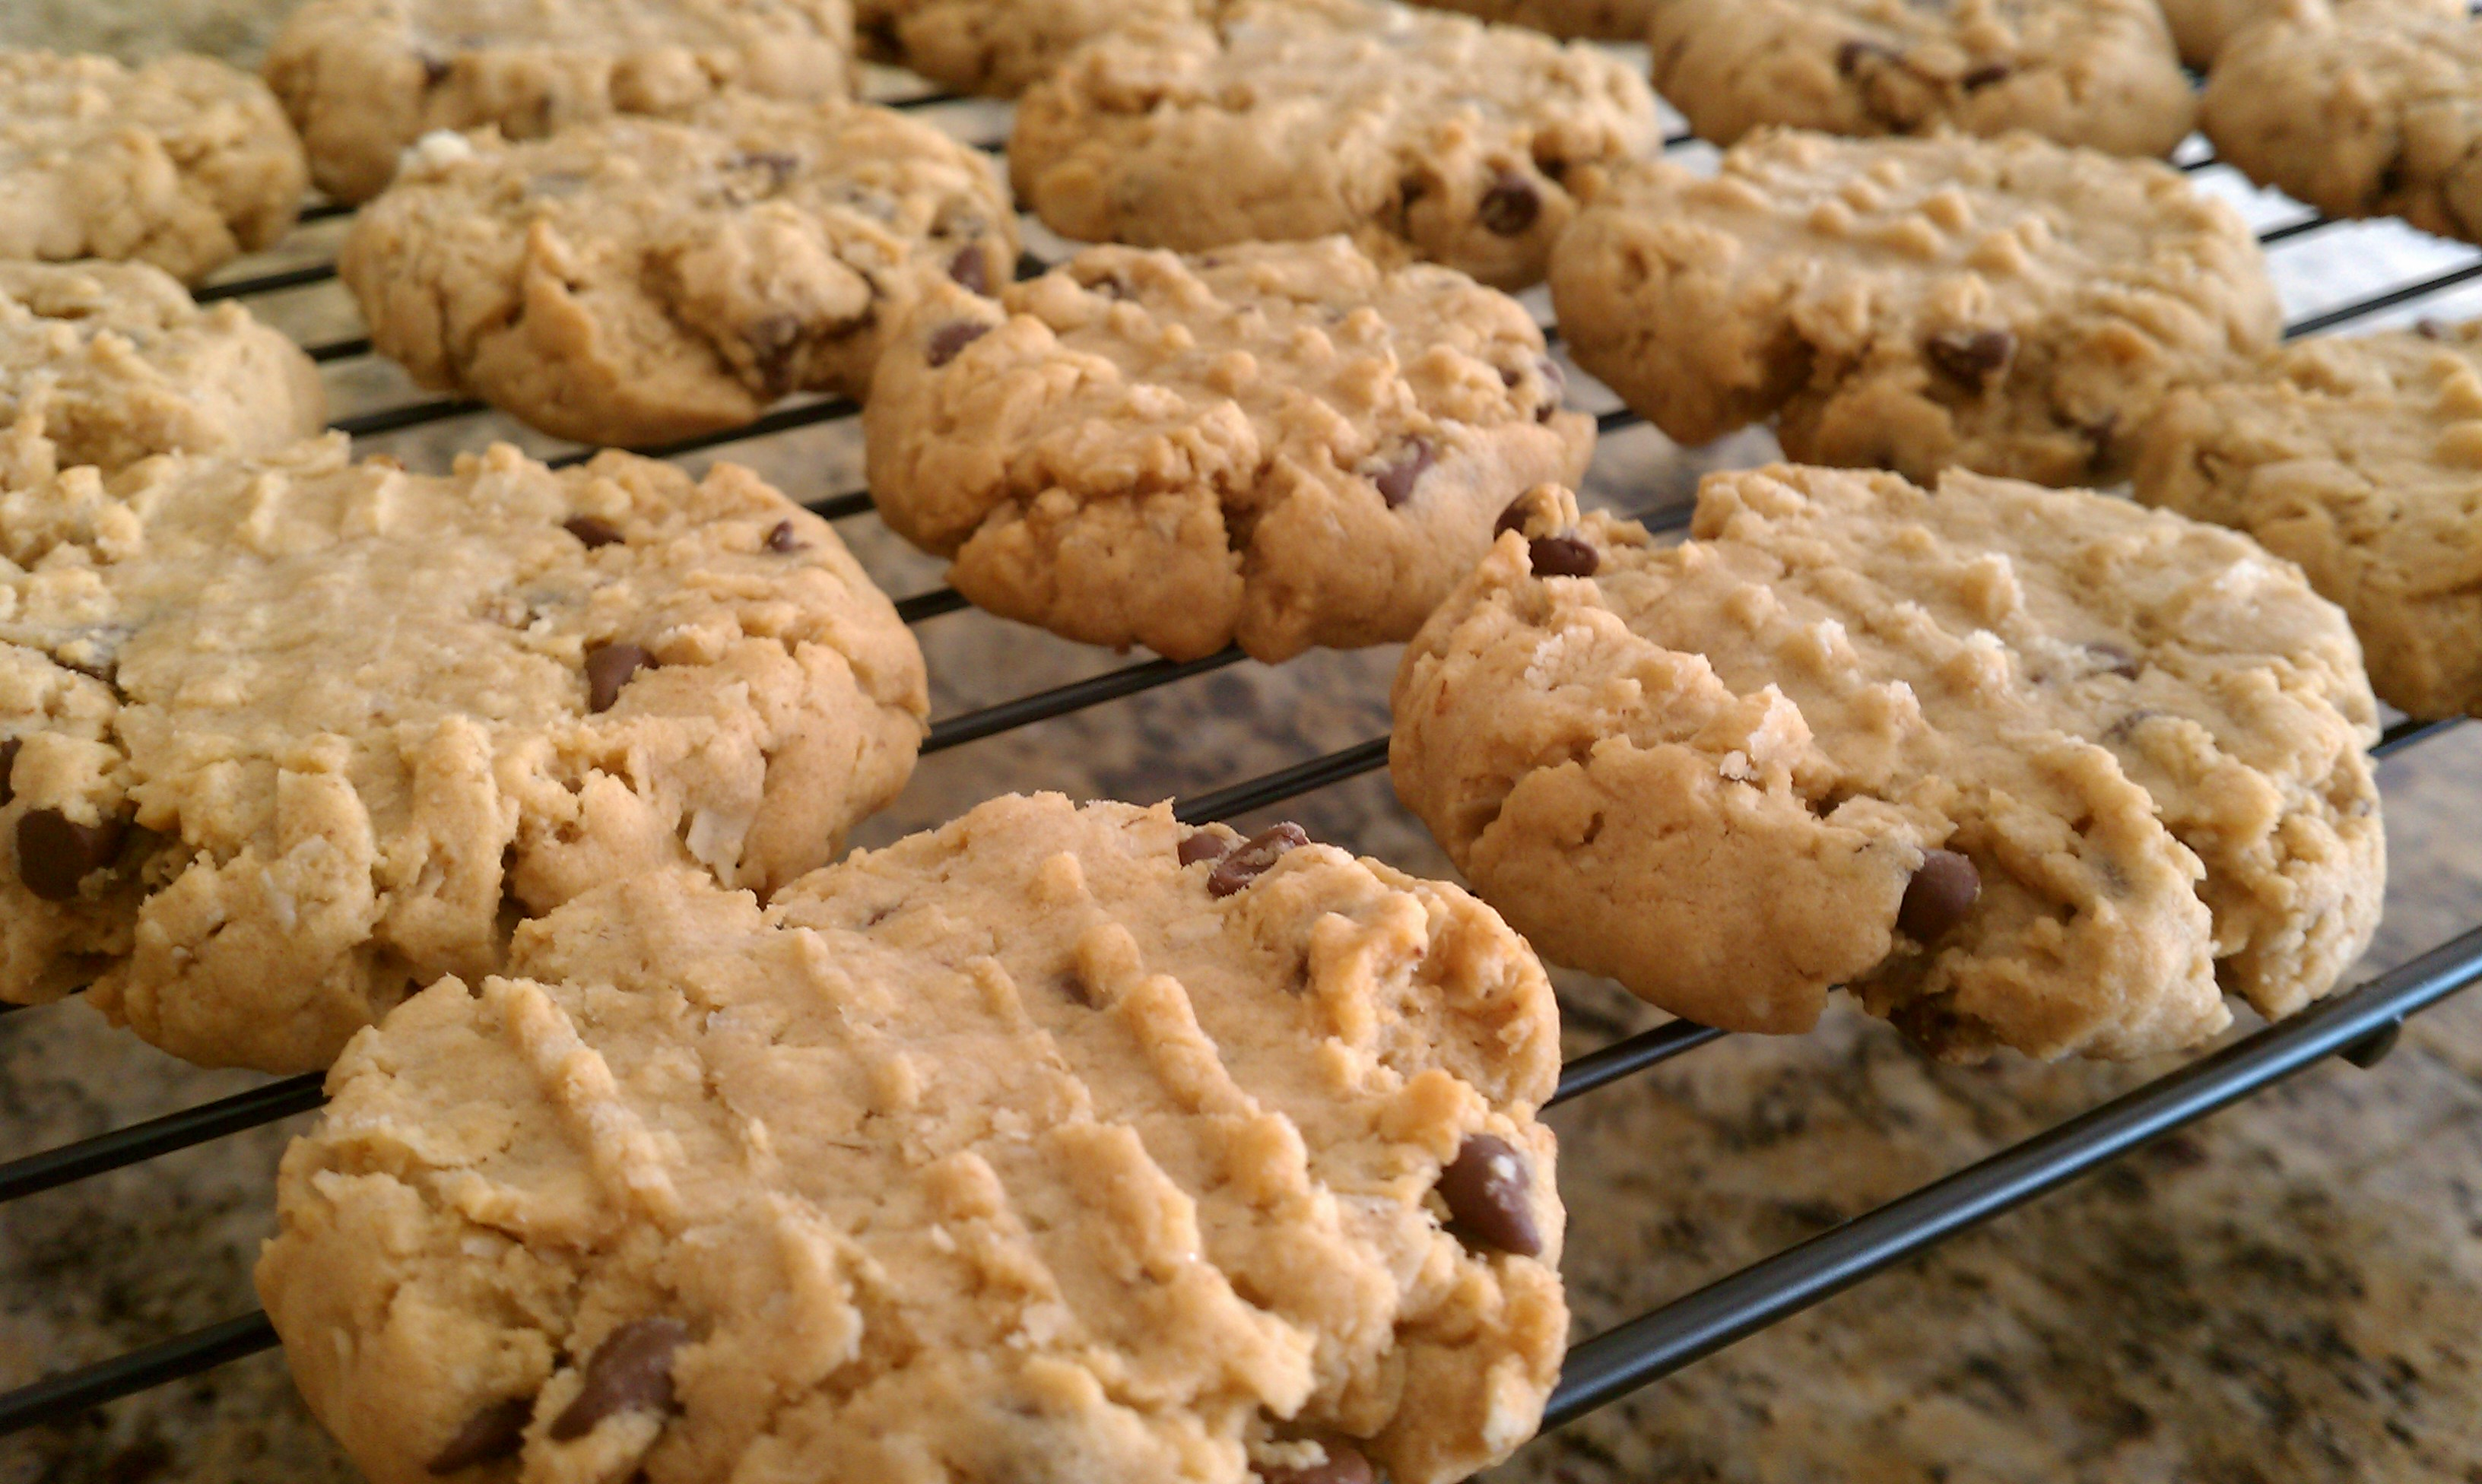 jose%27s oatmeal peanut butter chocolate chip cookies recipe